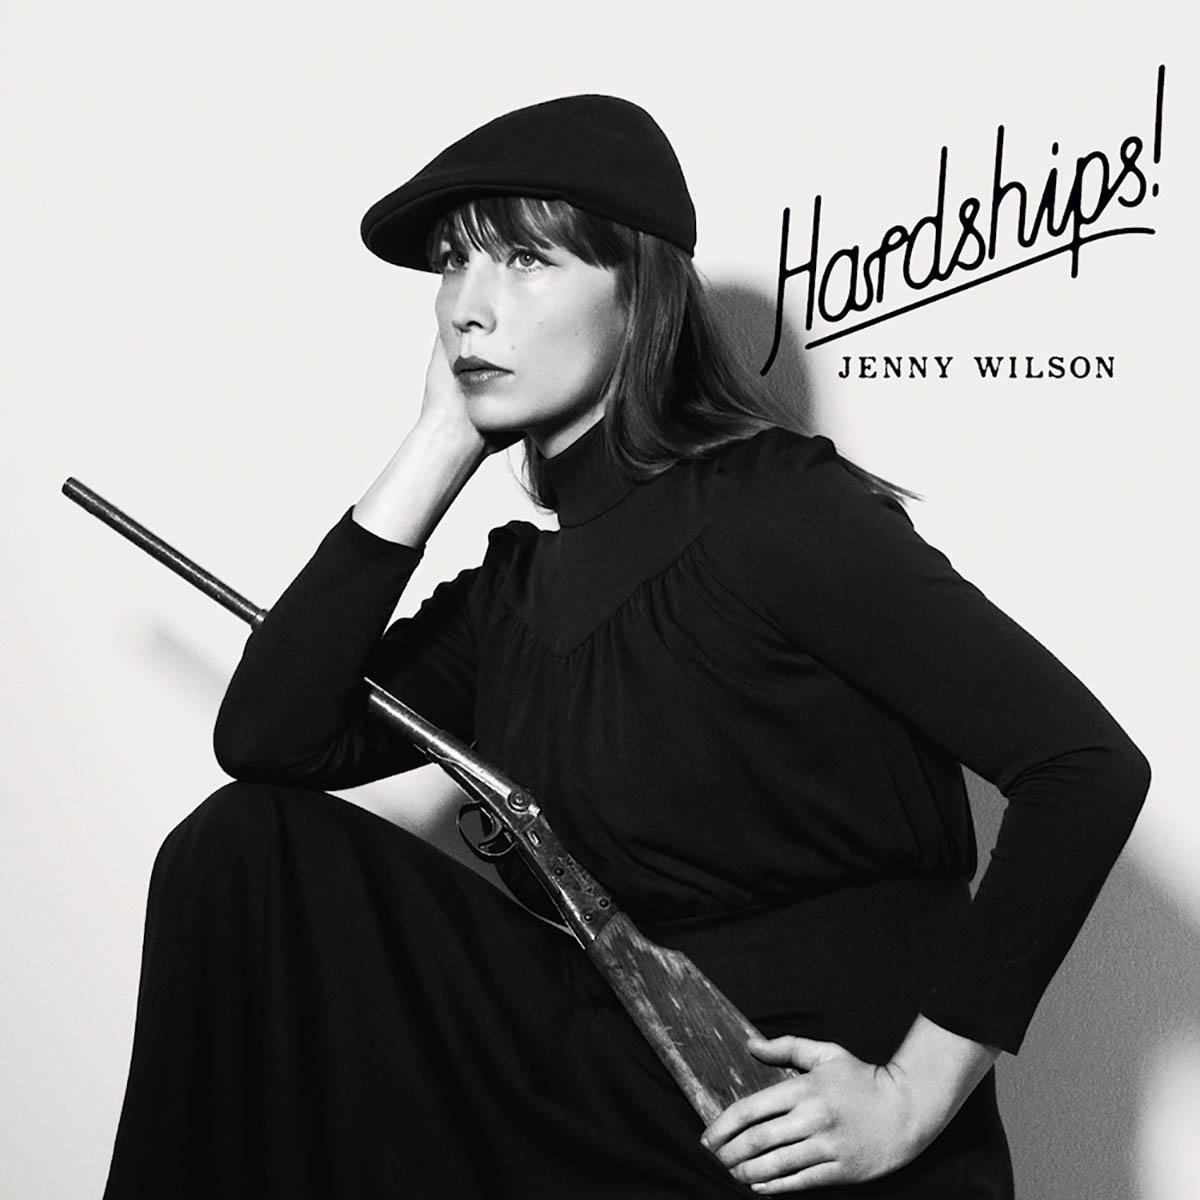 Jenny Wilson, Hardships!